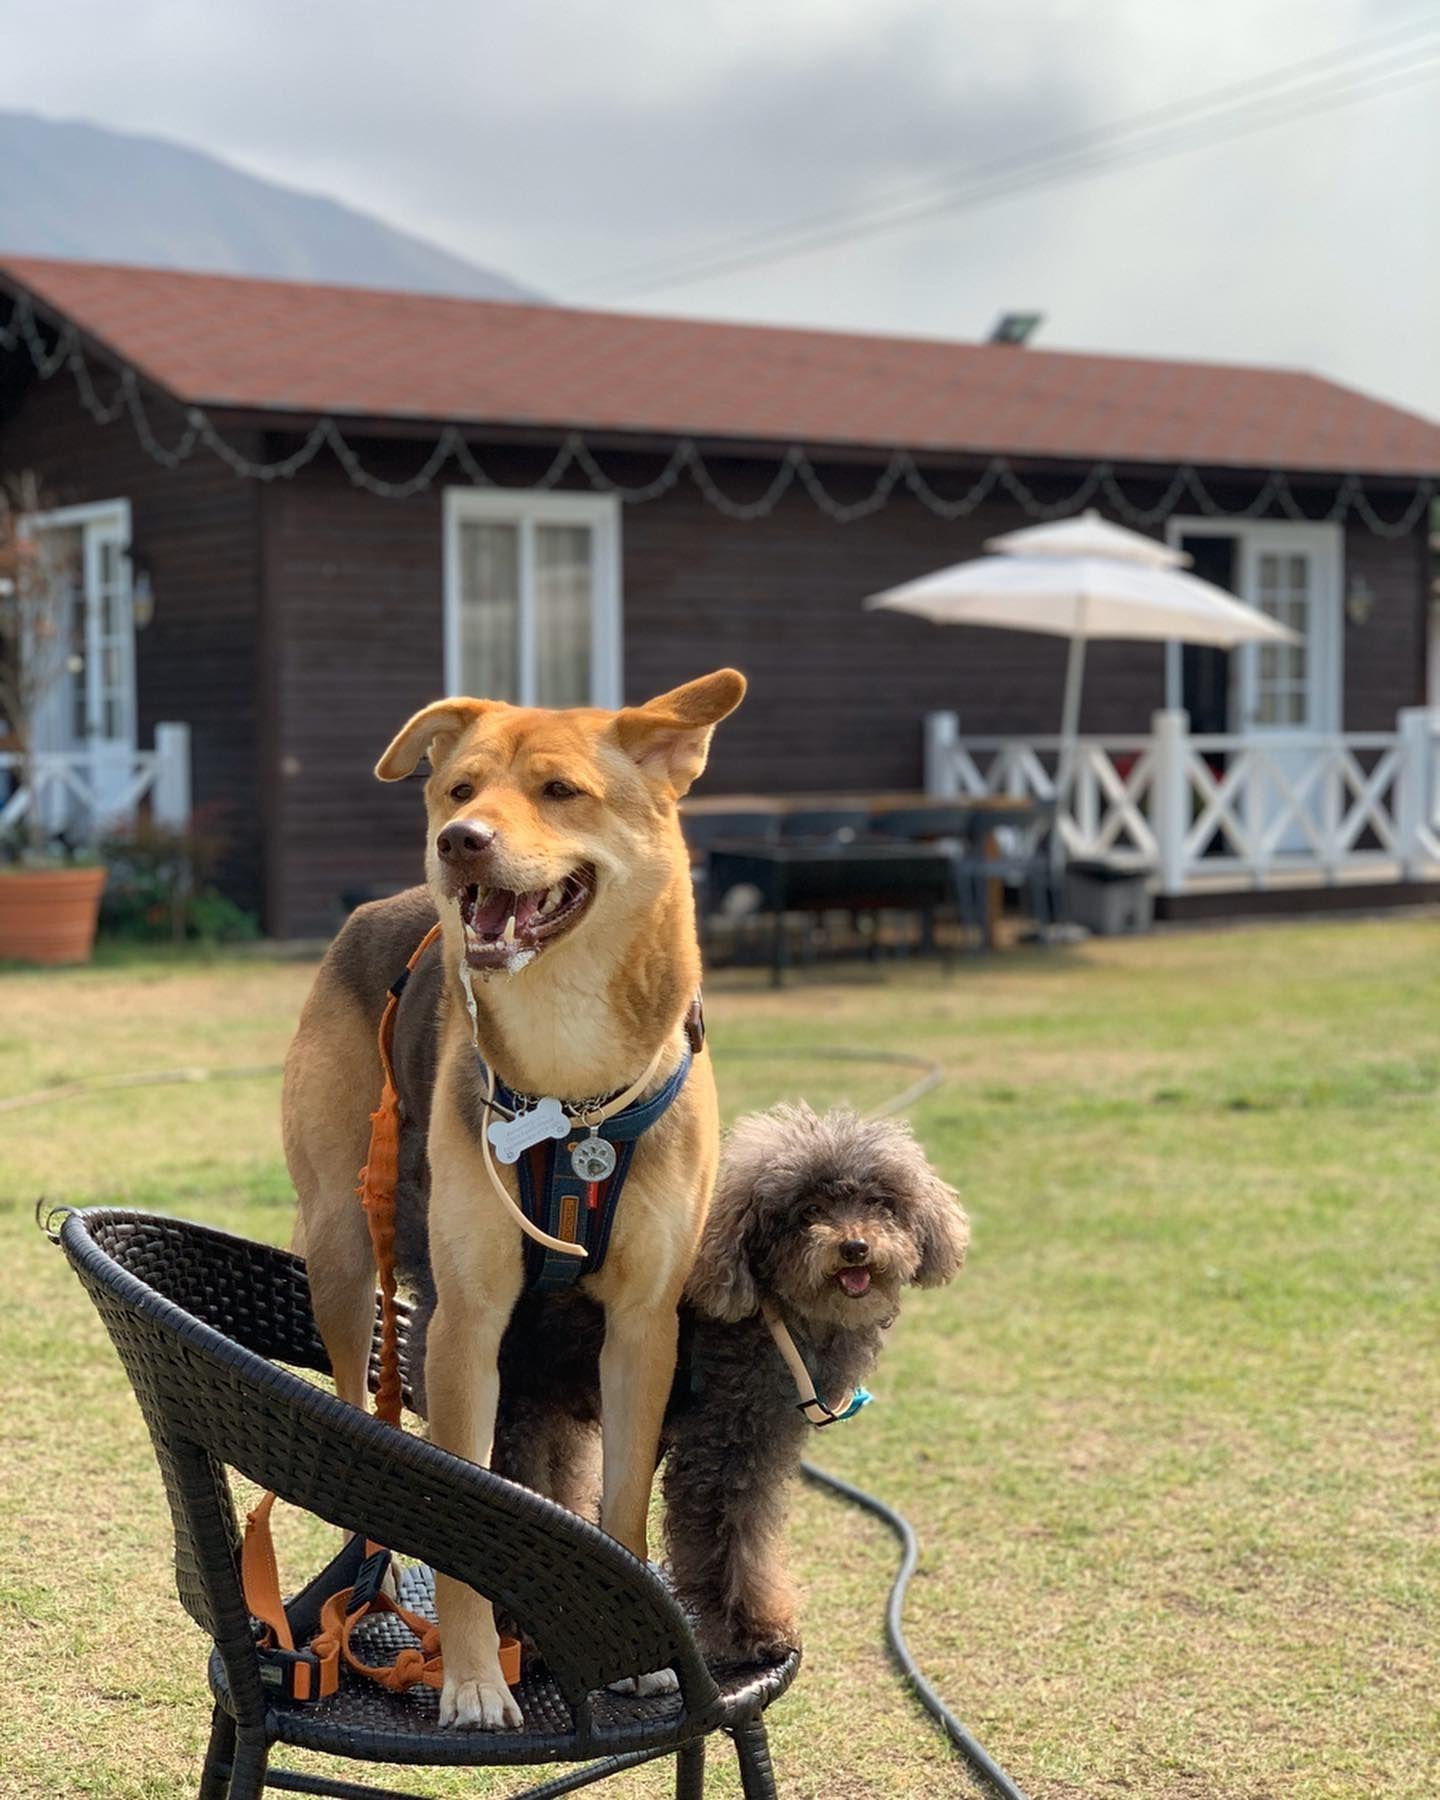 Me and my pal going on an adventure .  #領養不購買 #領養不棄養 #dogtography #dogue #caravan #dogstagram #hkig #igers #hk #hkgirl #hkdog  #rescuedogsofinstagram #poodlesofinstagram#mongrelsofinstagram #mongrel #dog  #brothers #100happydays #happy #life #fashion #family #adoptdontshop #miloandsodahkadventures  #miloandsodastaycation #weekend #唐狗 #唐狗也是寶 ( #📷 @themiloandsodadiaryhk )